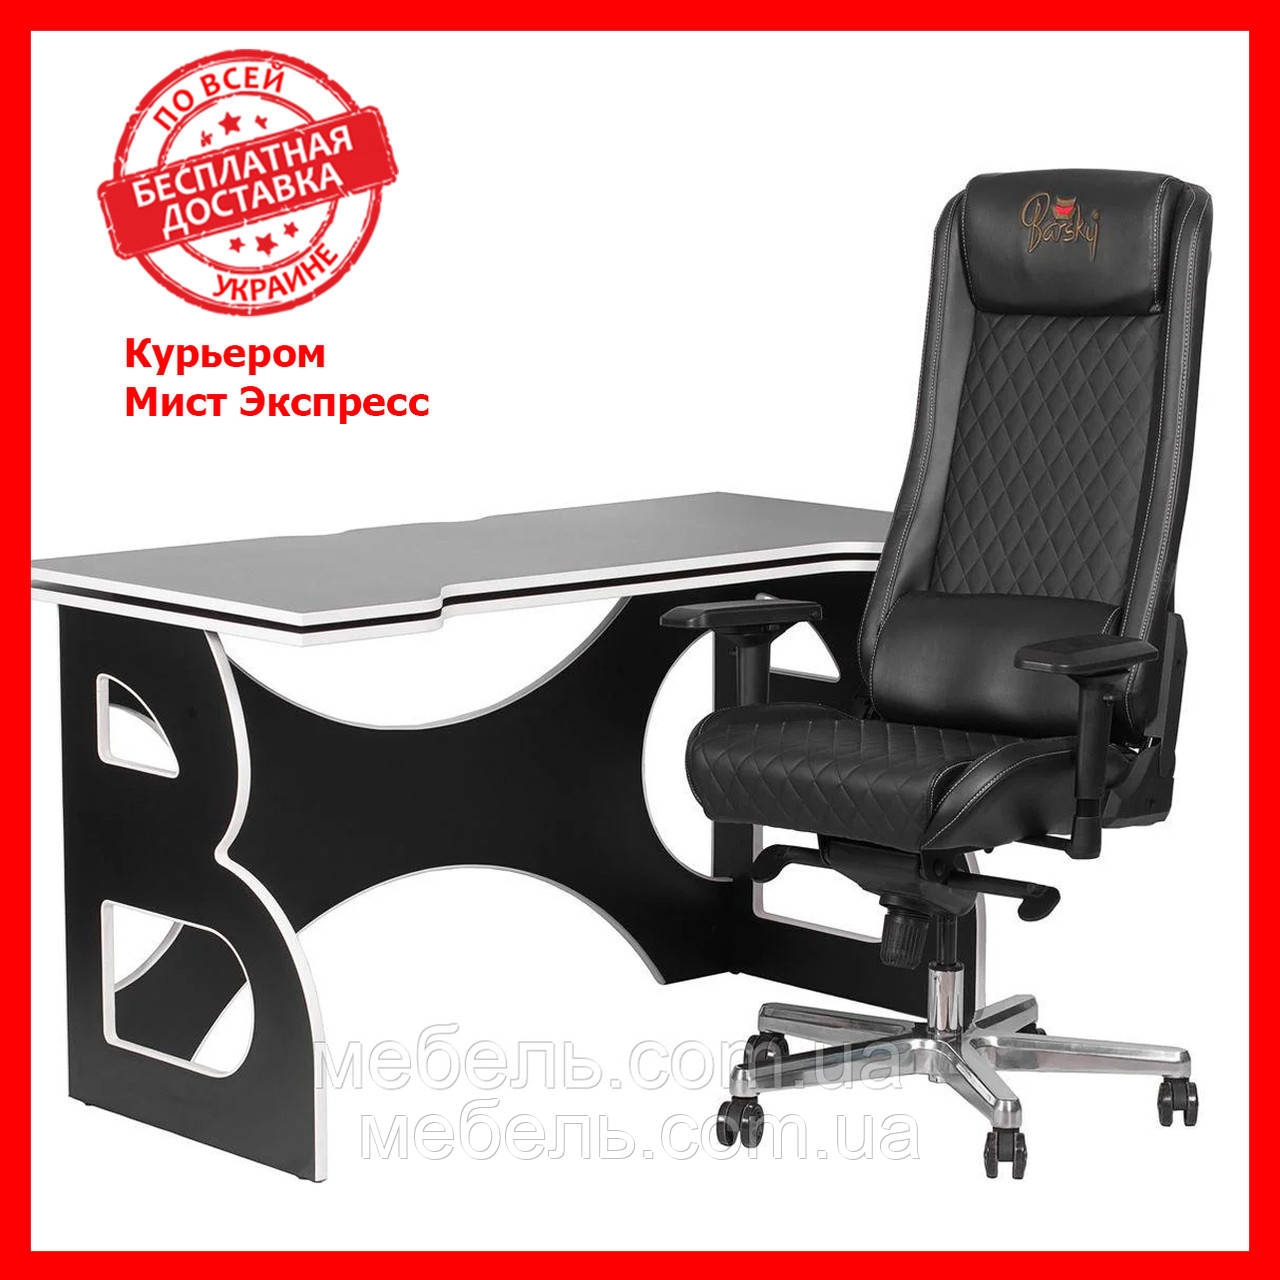 Комп'ютерні столи геймерська станція Barsky Homework Game Black/White HG-06/GB-01